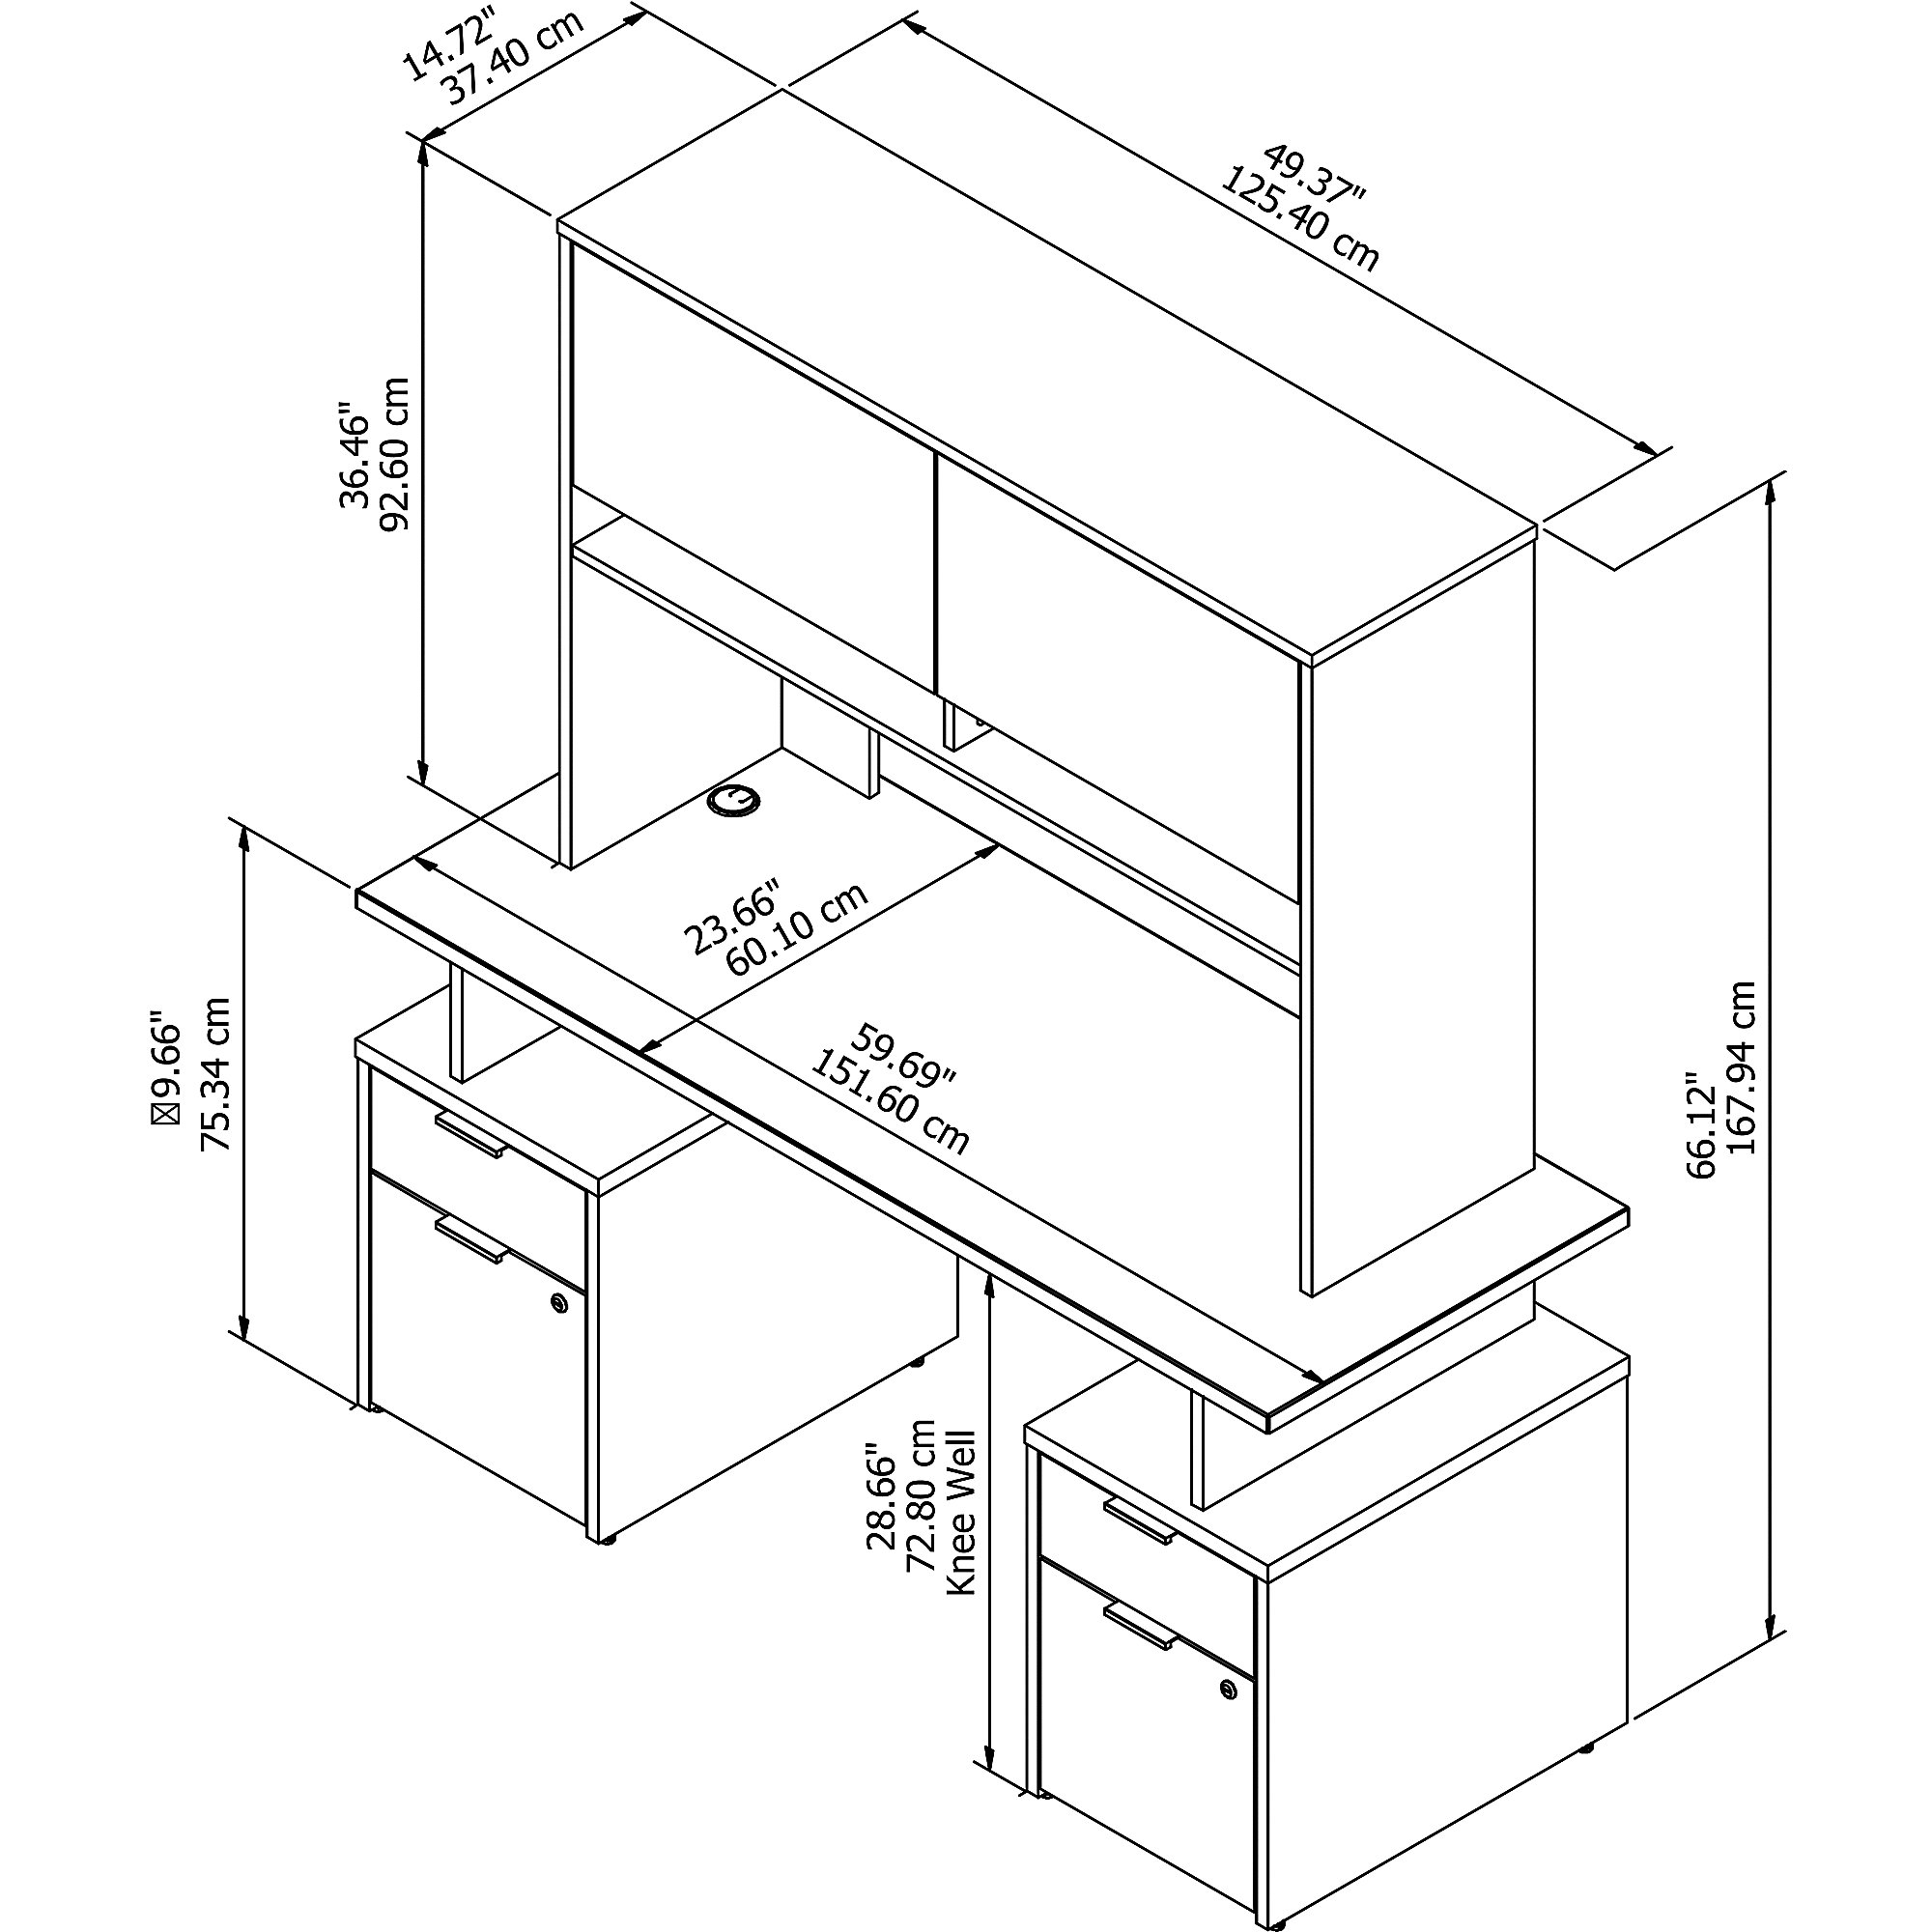 jamestown jtn018 desk dimensions